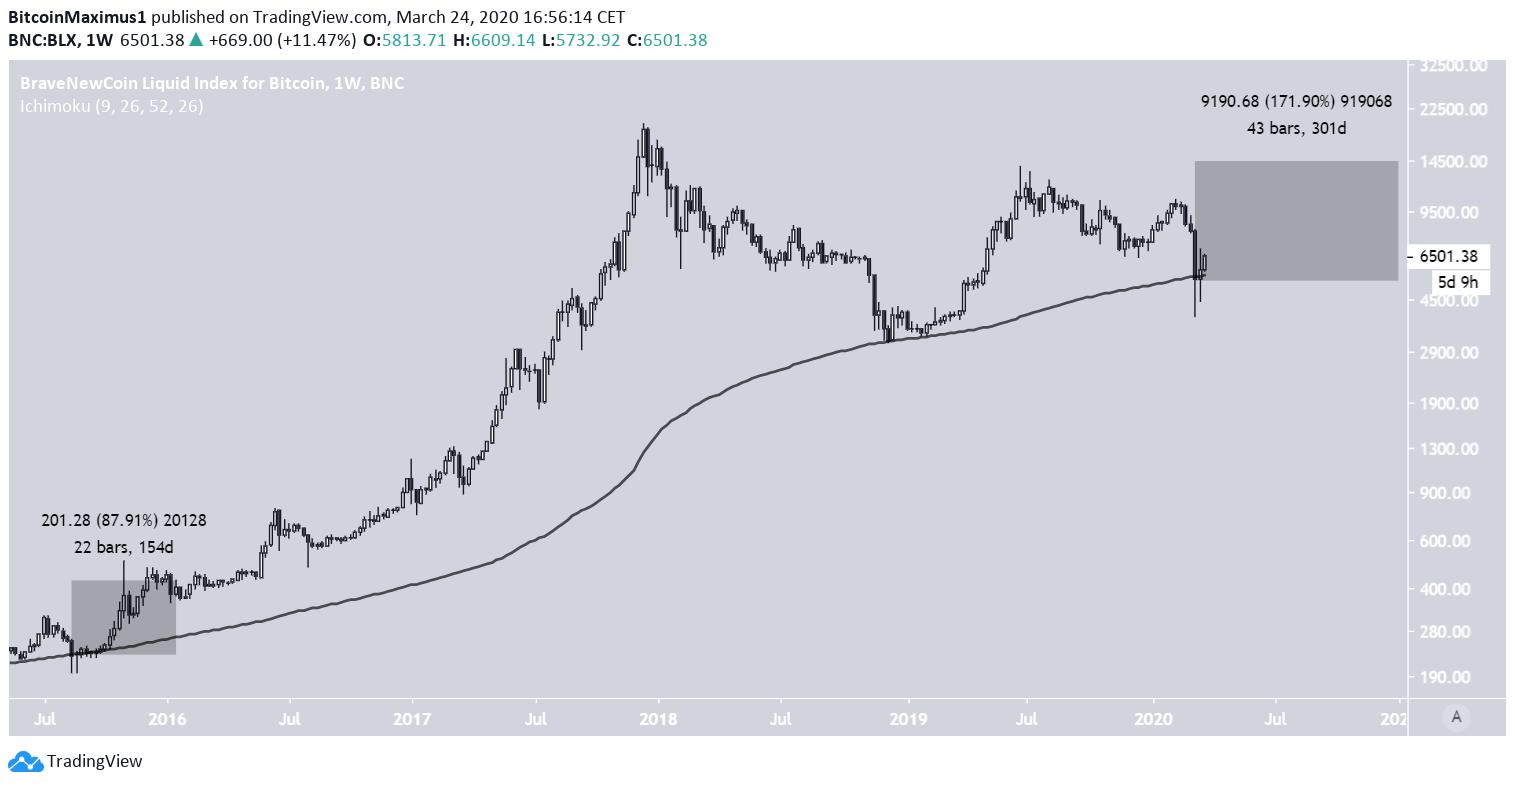 (BTC) Bitcoin Price Prediction 2020 / 2021 / 5 years ...